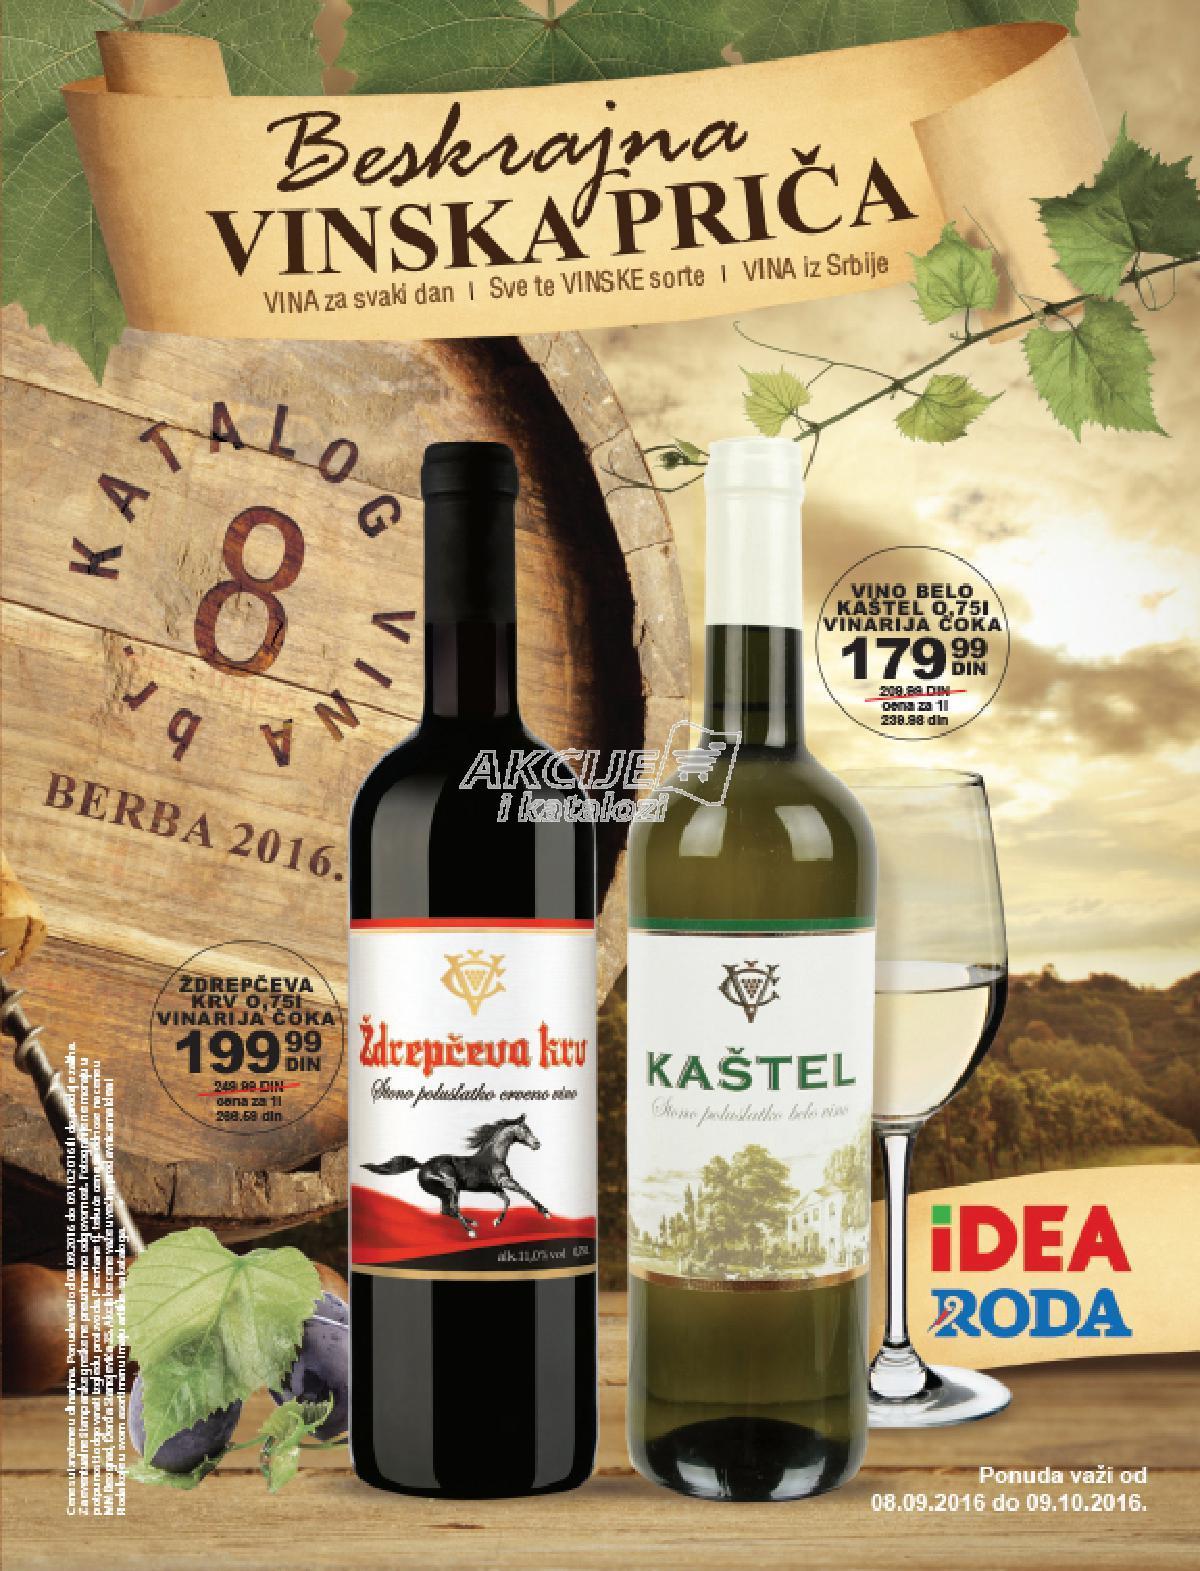 Roda - Redovna akcija katalog bejskrajna vinska priča